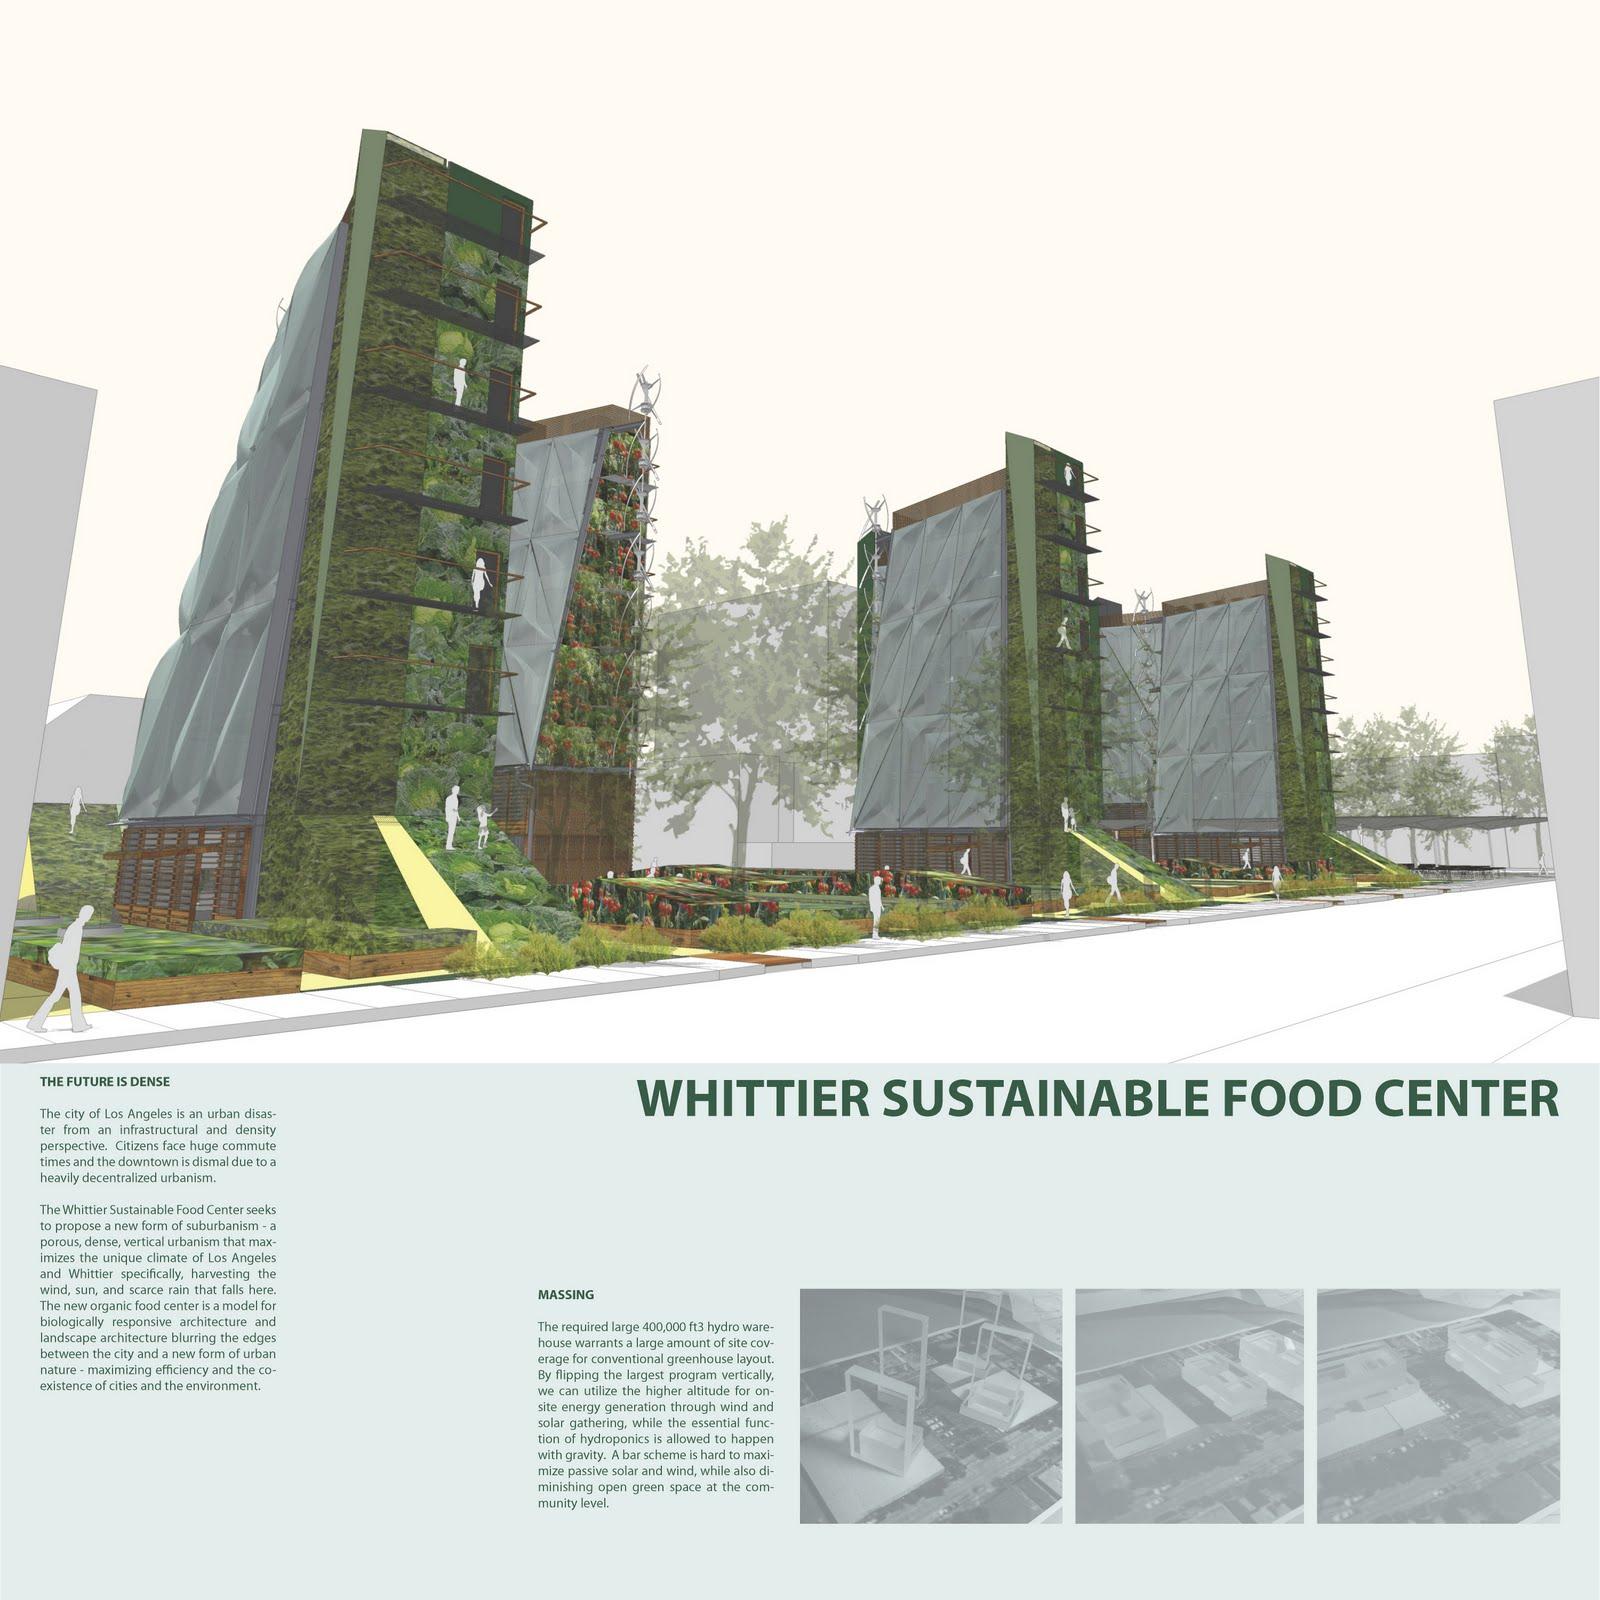 Talkitect Architecture And Urbanism 08 01 2011 09 01 2011